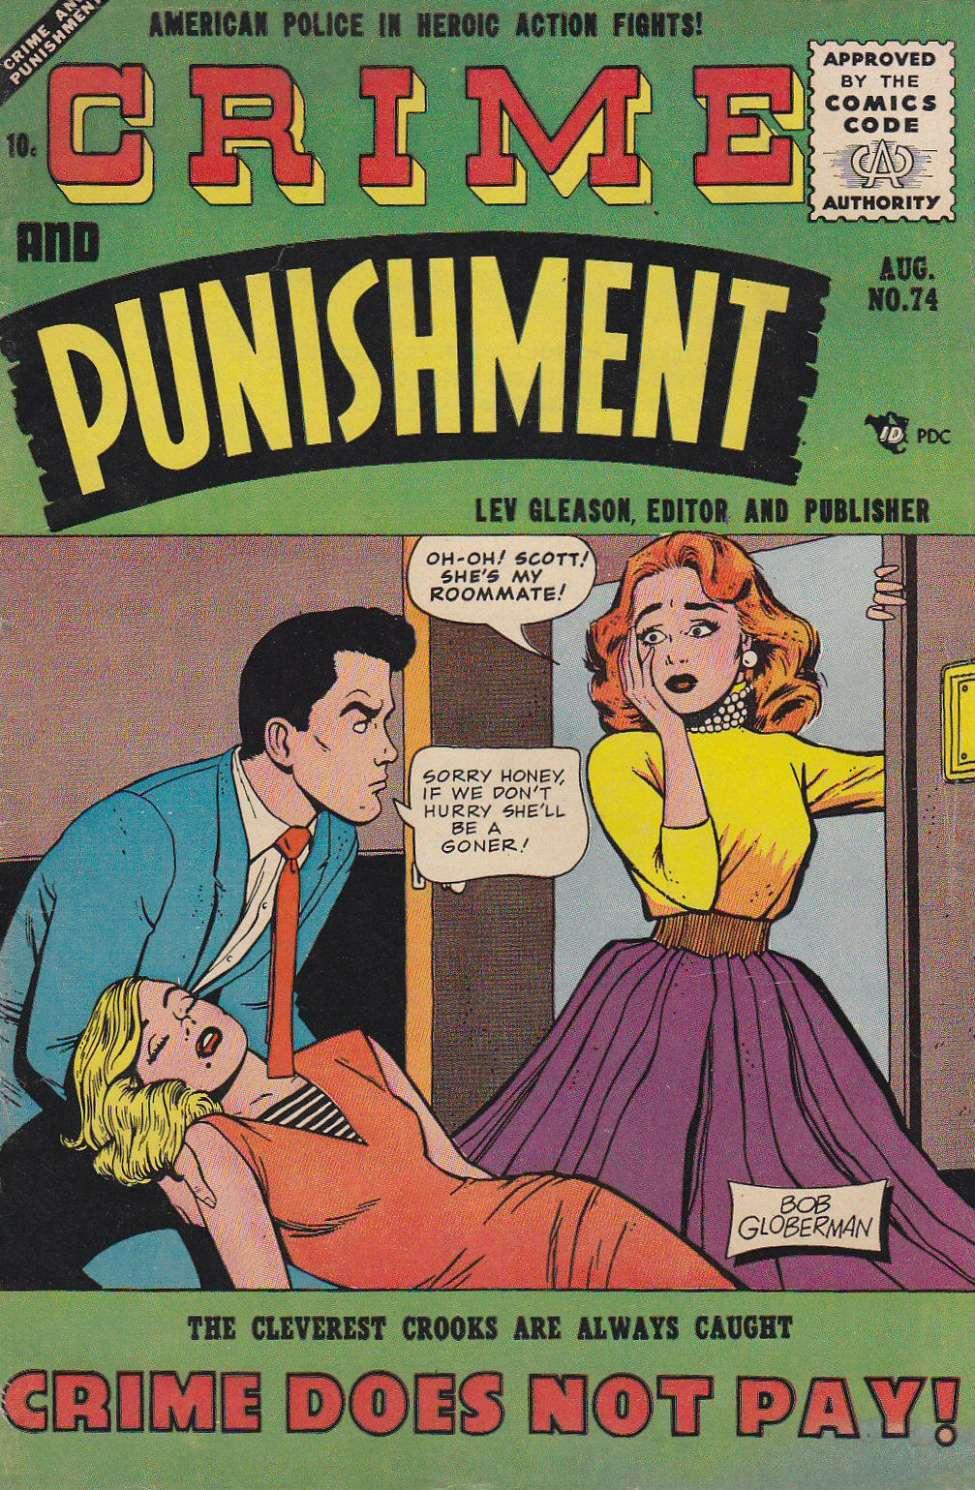 Crime and Punishment #74, Lev Gleason